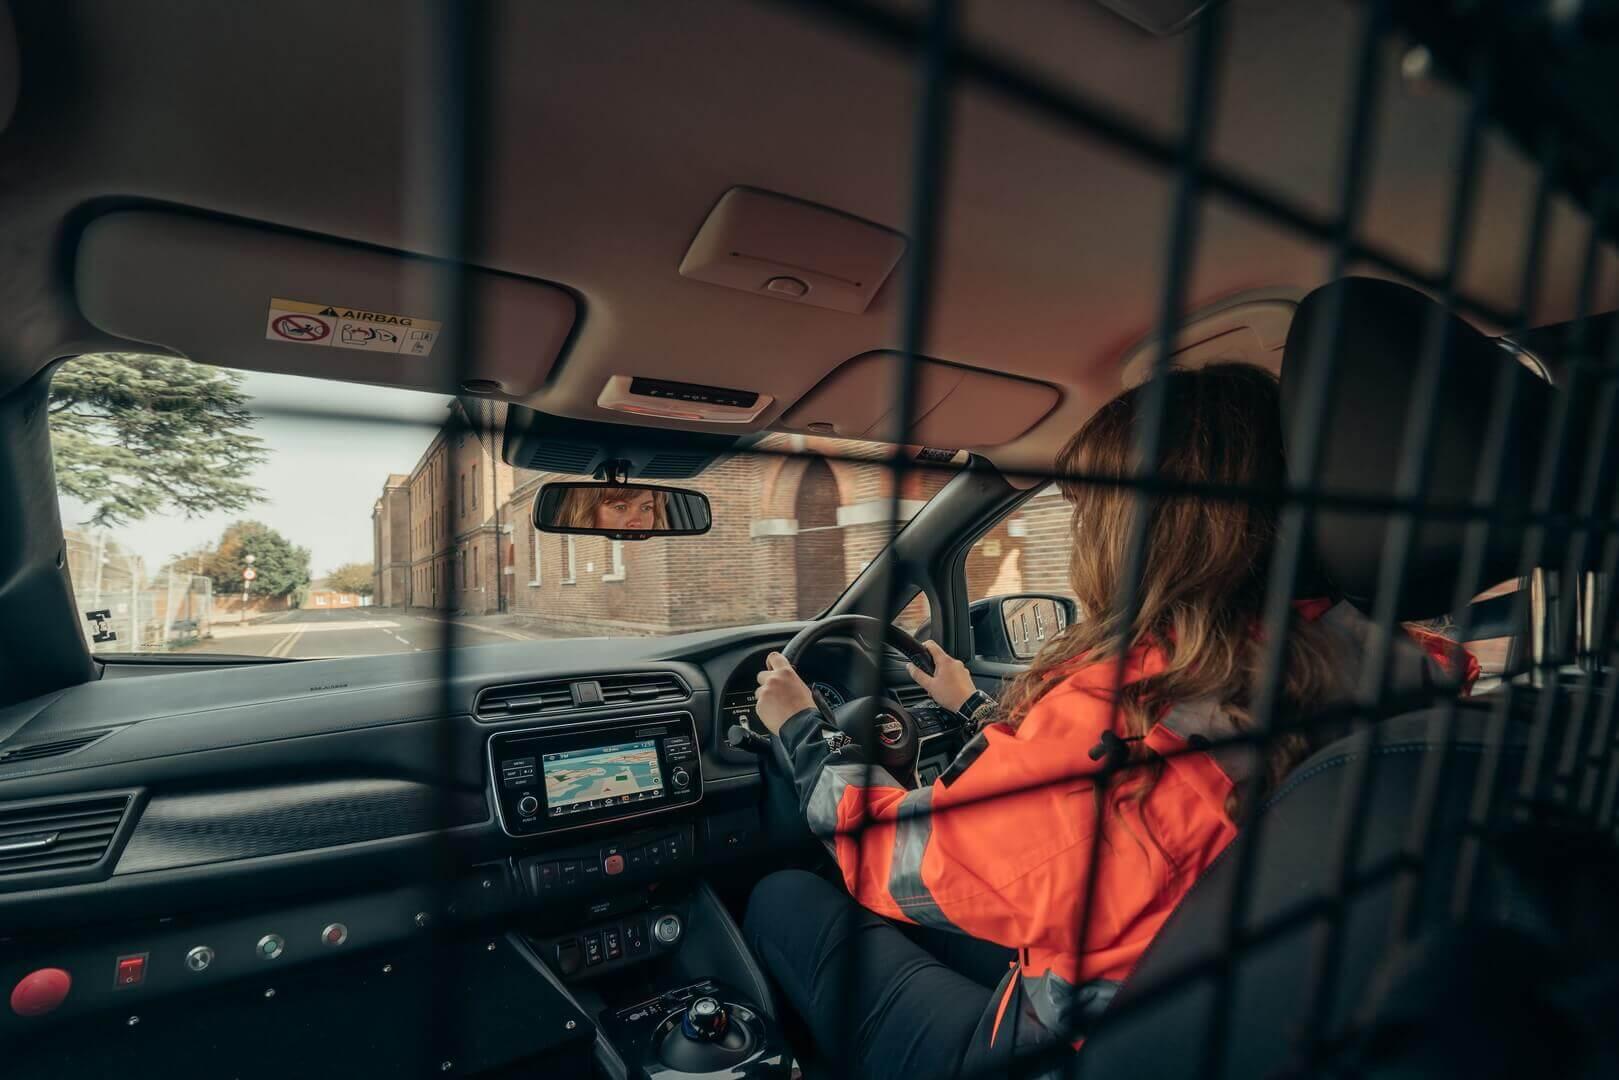 Салон с перегородкой аварийного электромобиля Nissan RE-LEAF